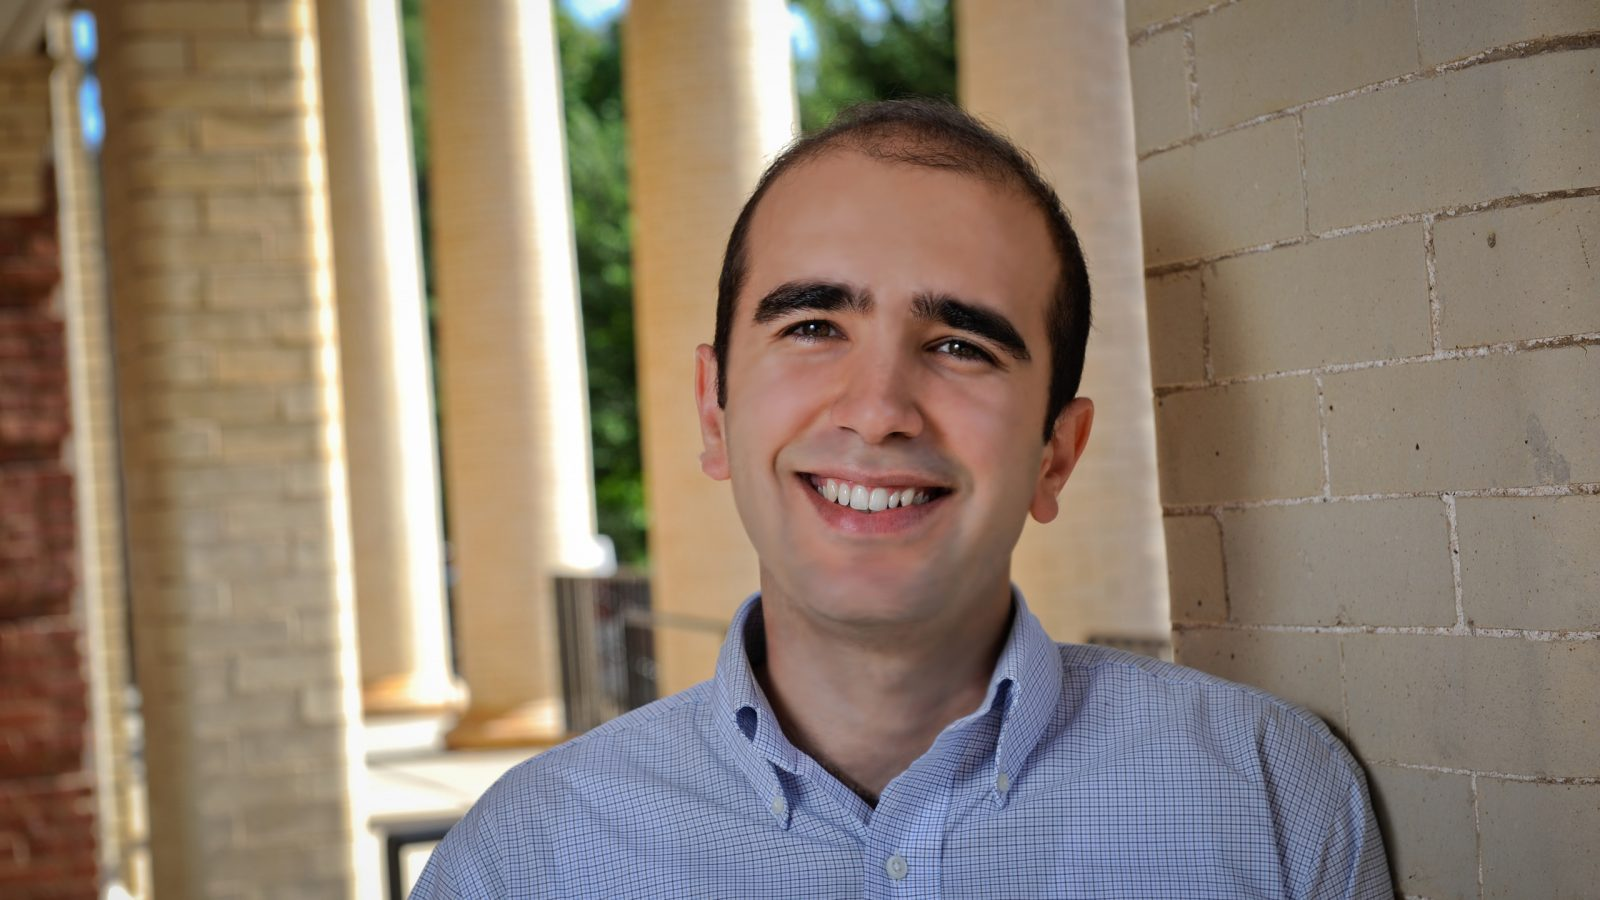 Faculty Profile: Osman Ozaltin